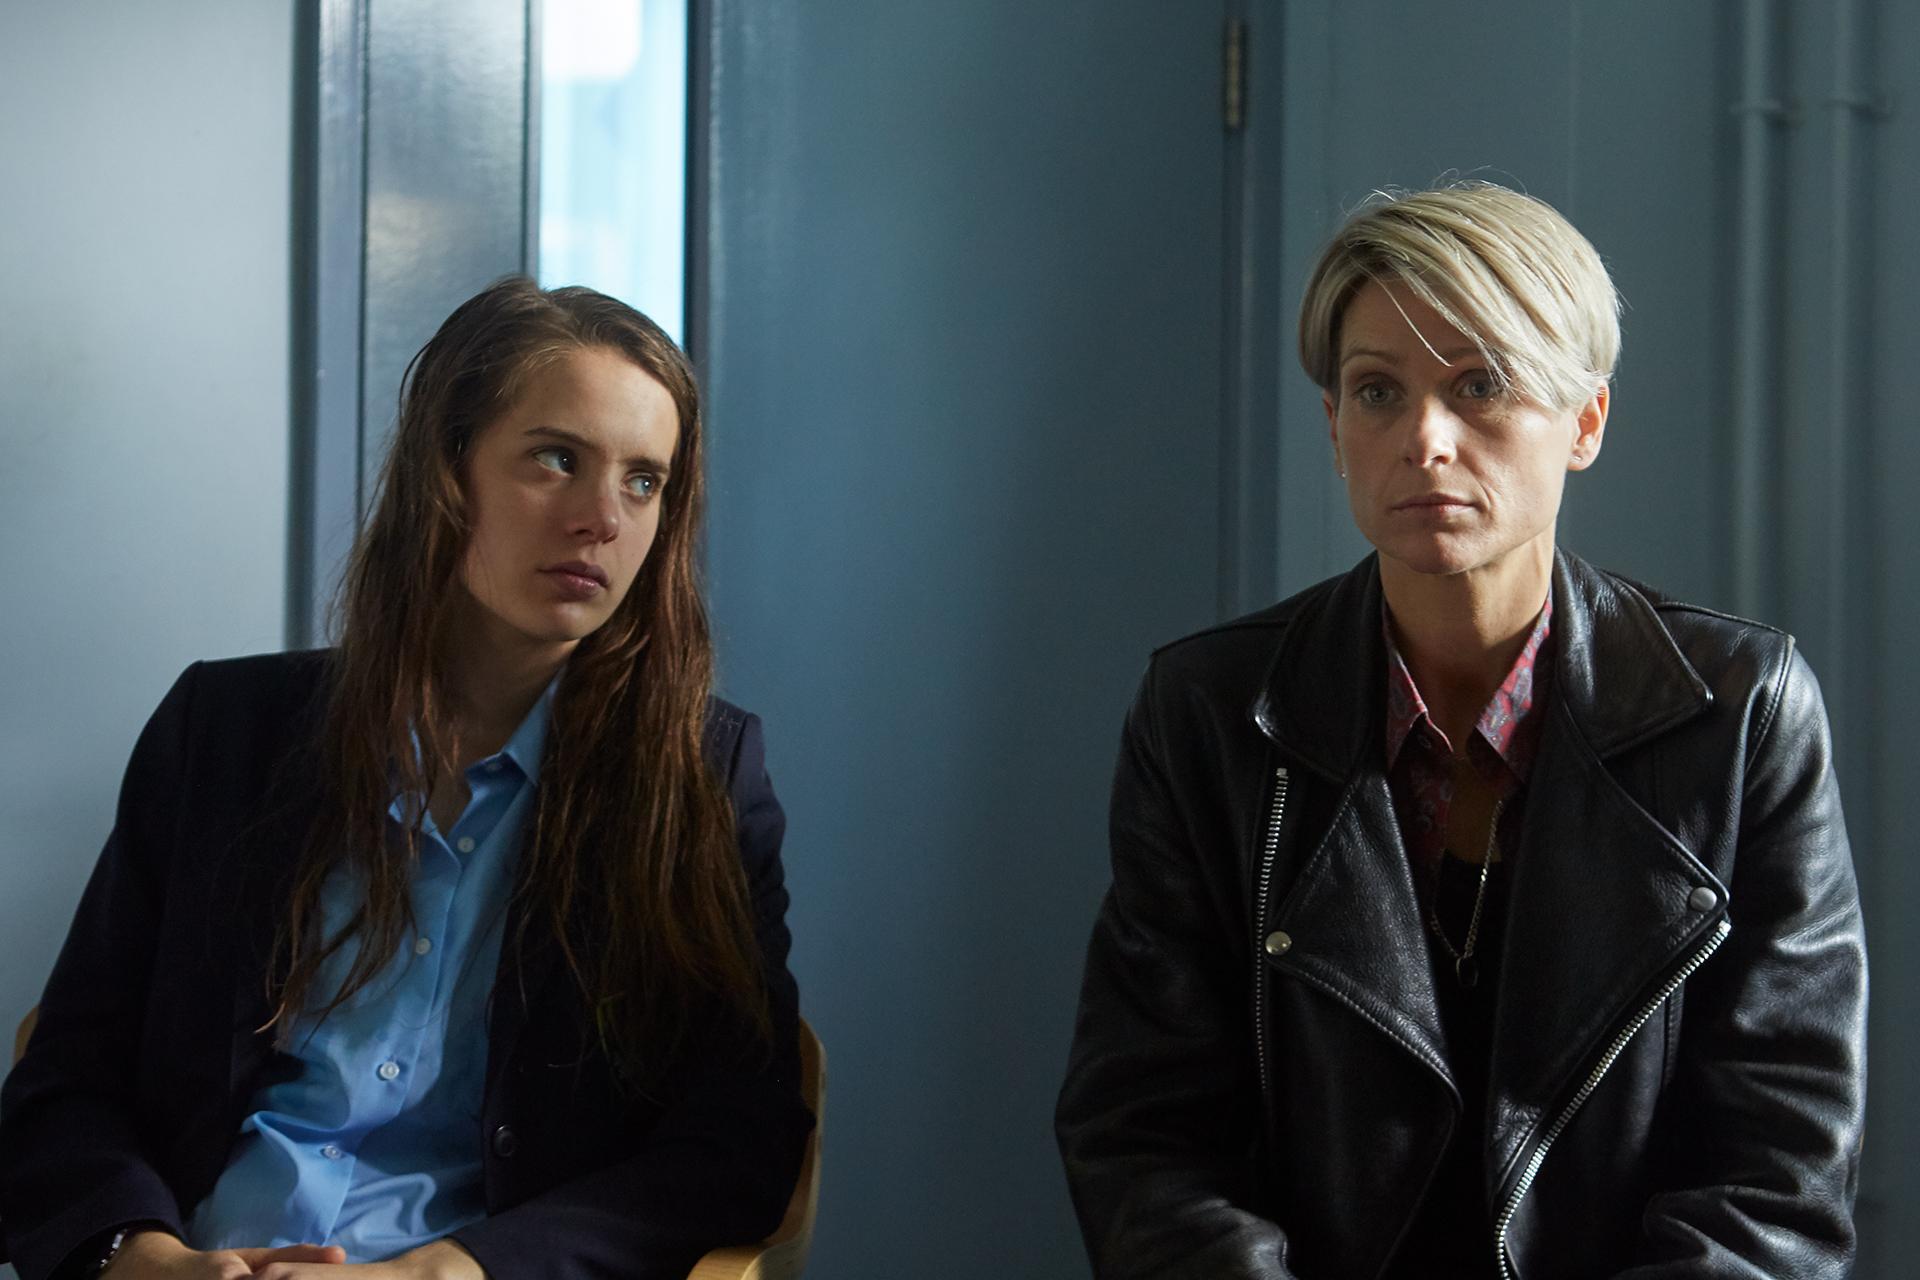 BOW_Still_5 (Fabienne Piolini-Castle as Pearl and Sian Brooke as Stephanie)